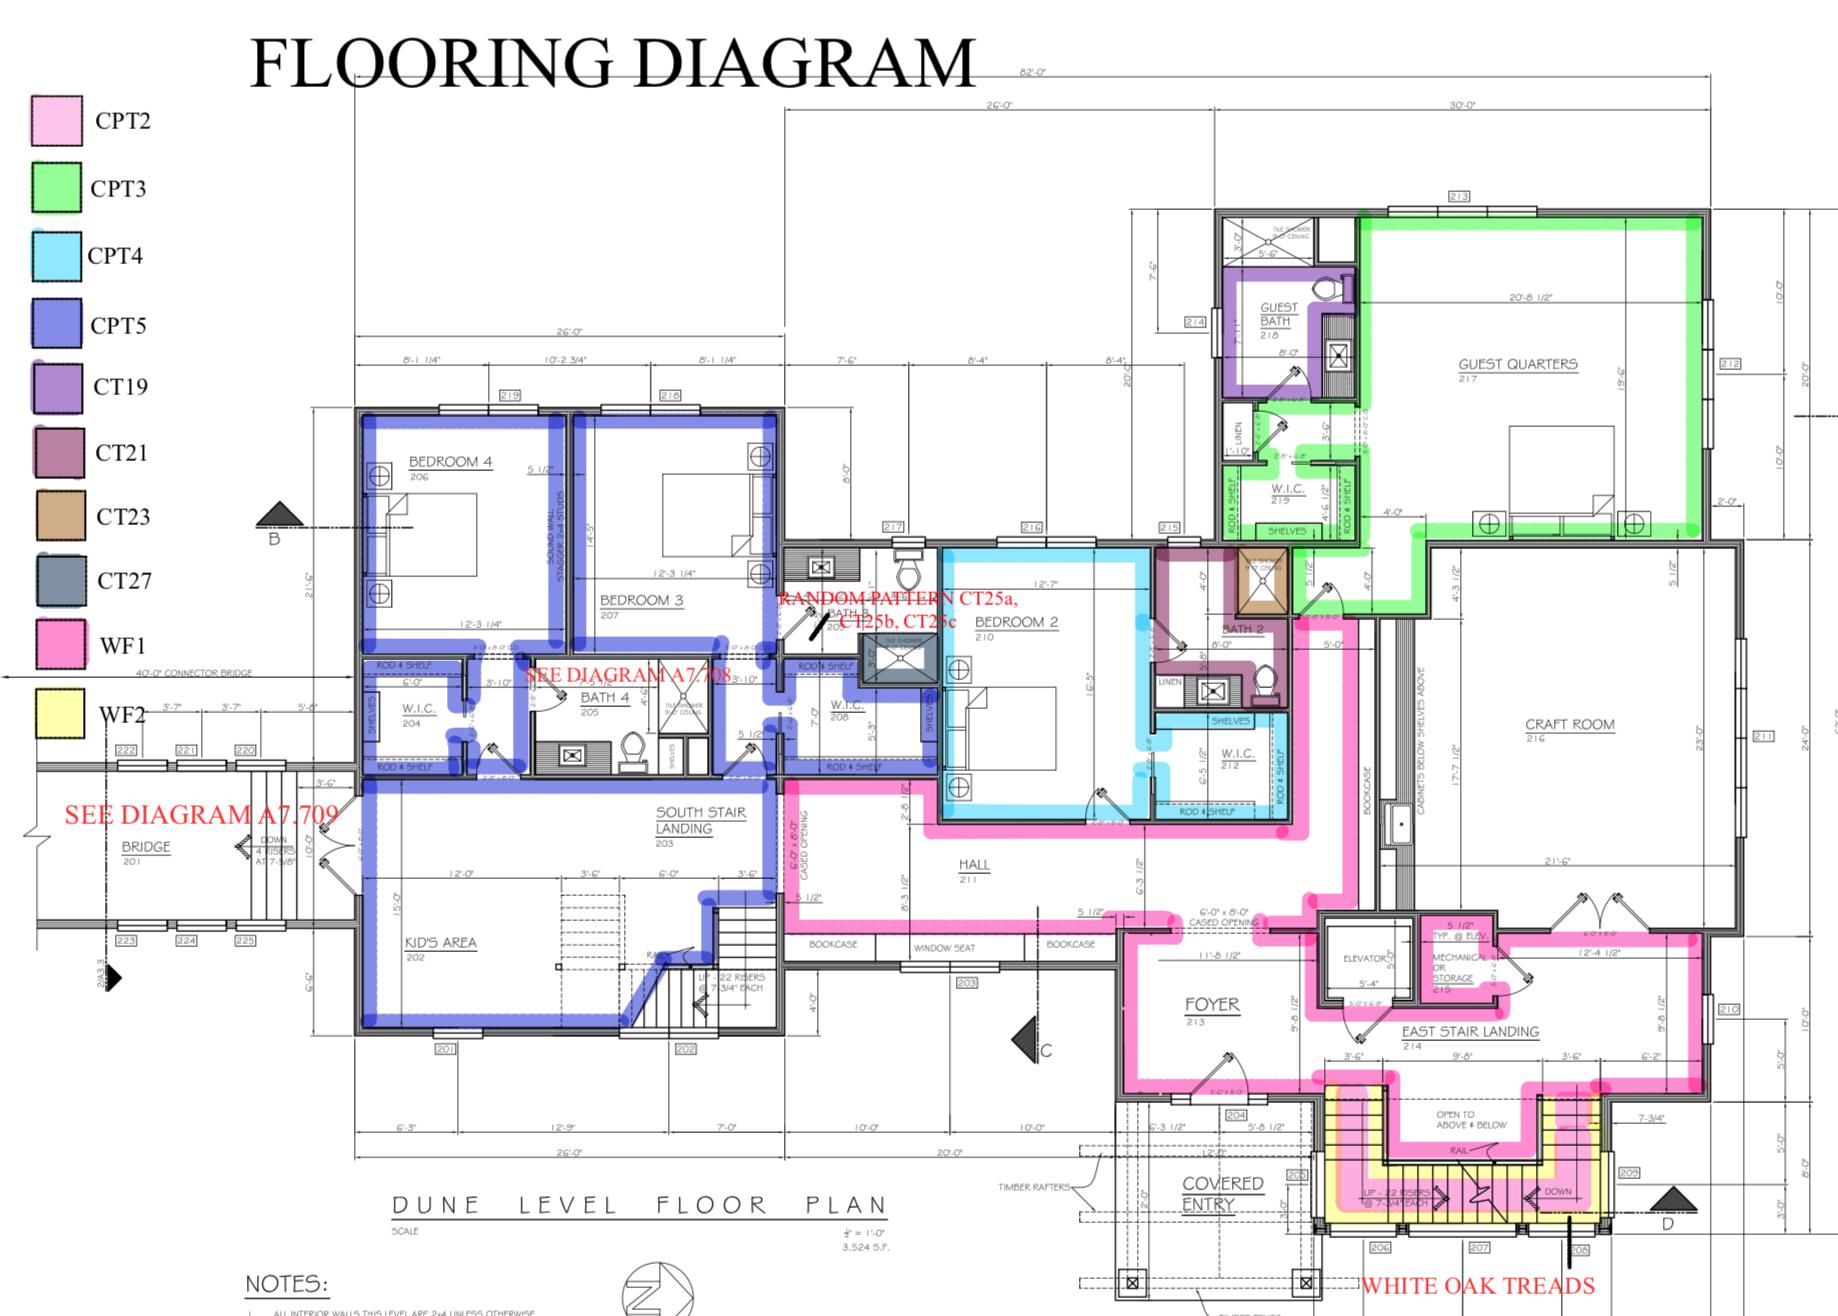 flooring diagram.png